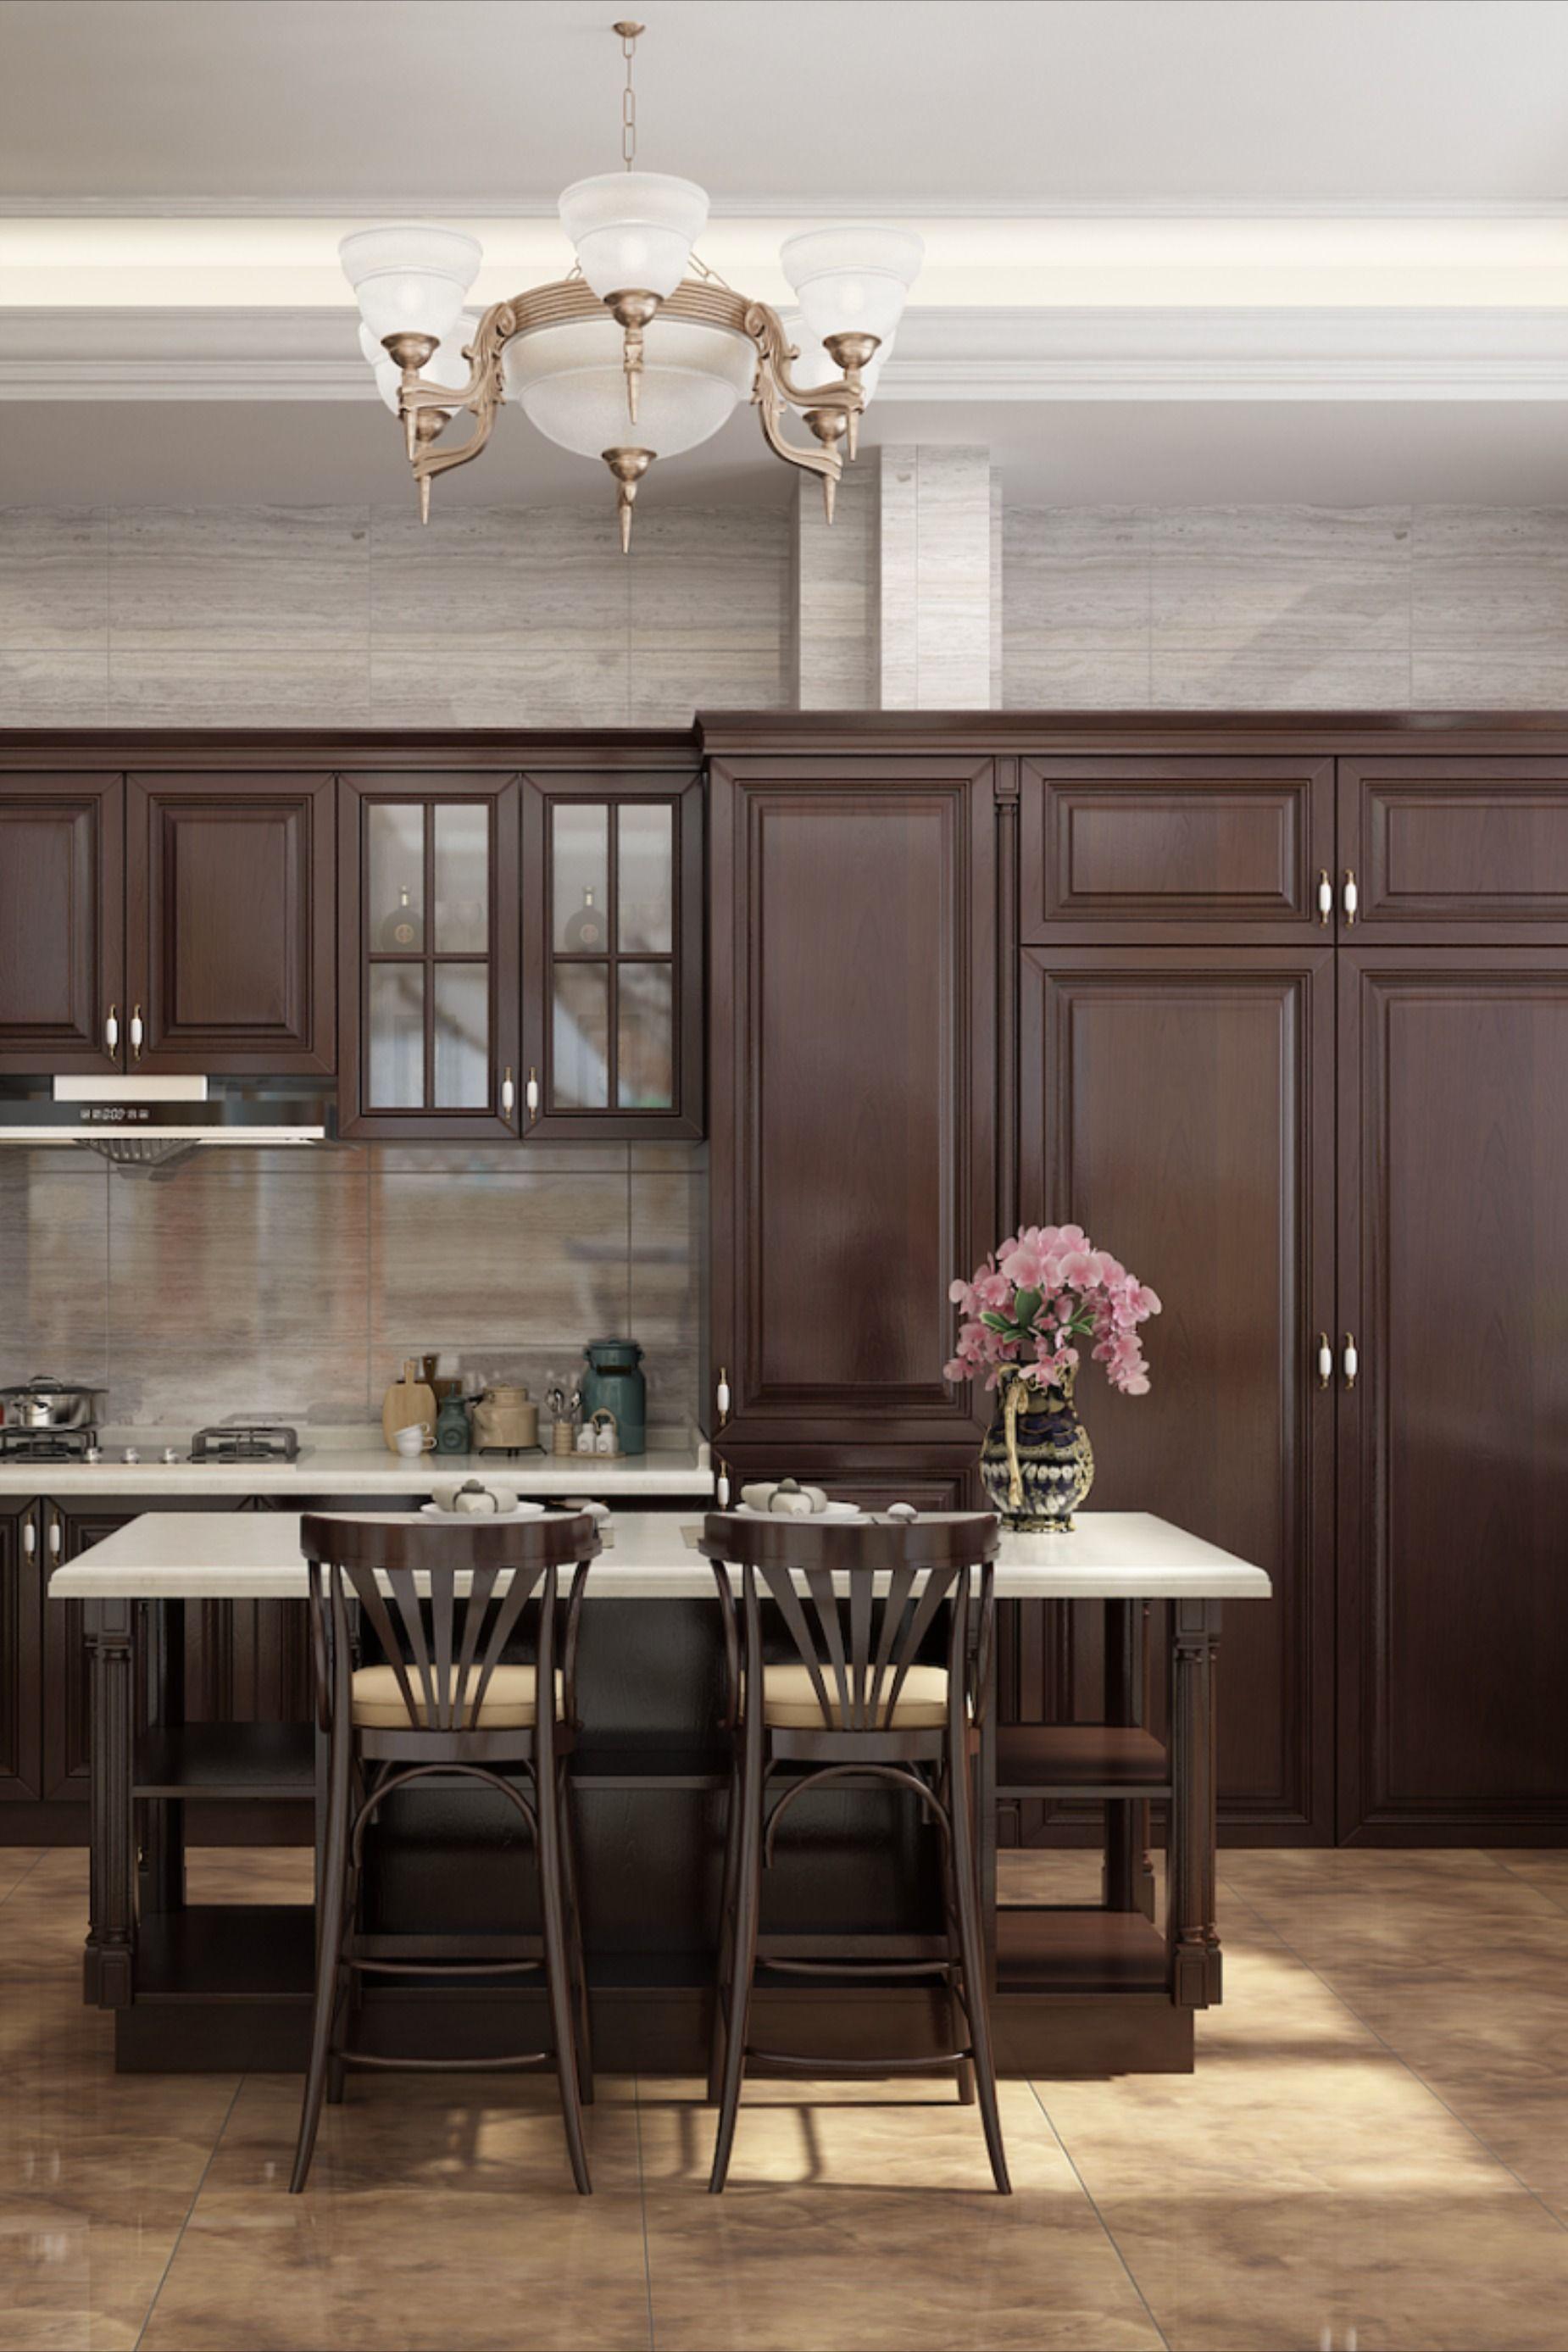 Pvc Blister Kitchen Cabinet Kitchen Cabinets Wooden Kitchen Cabinets Custom Kitchen Cabinets